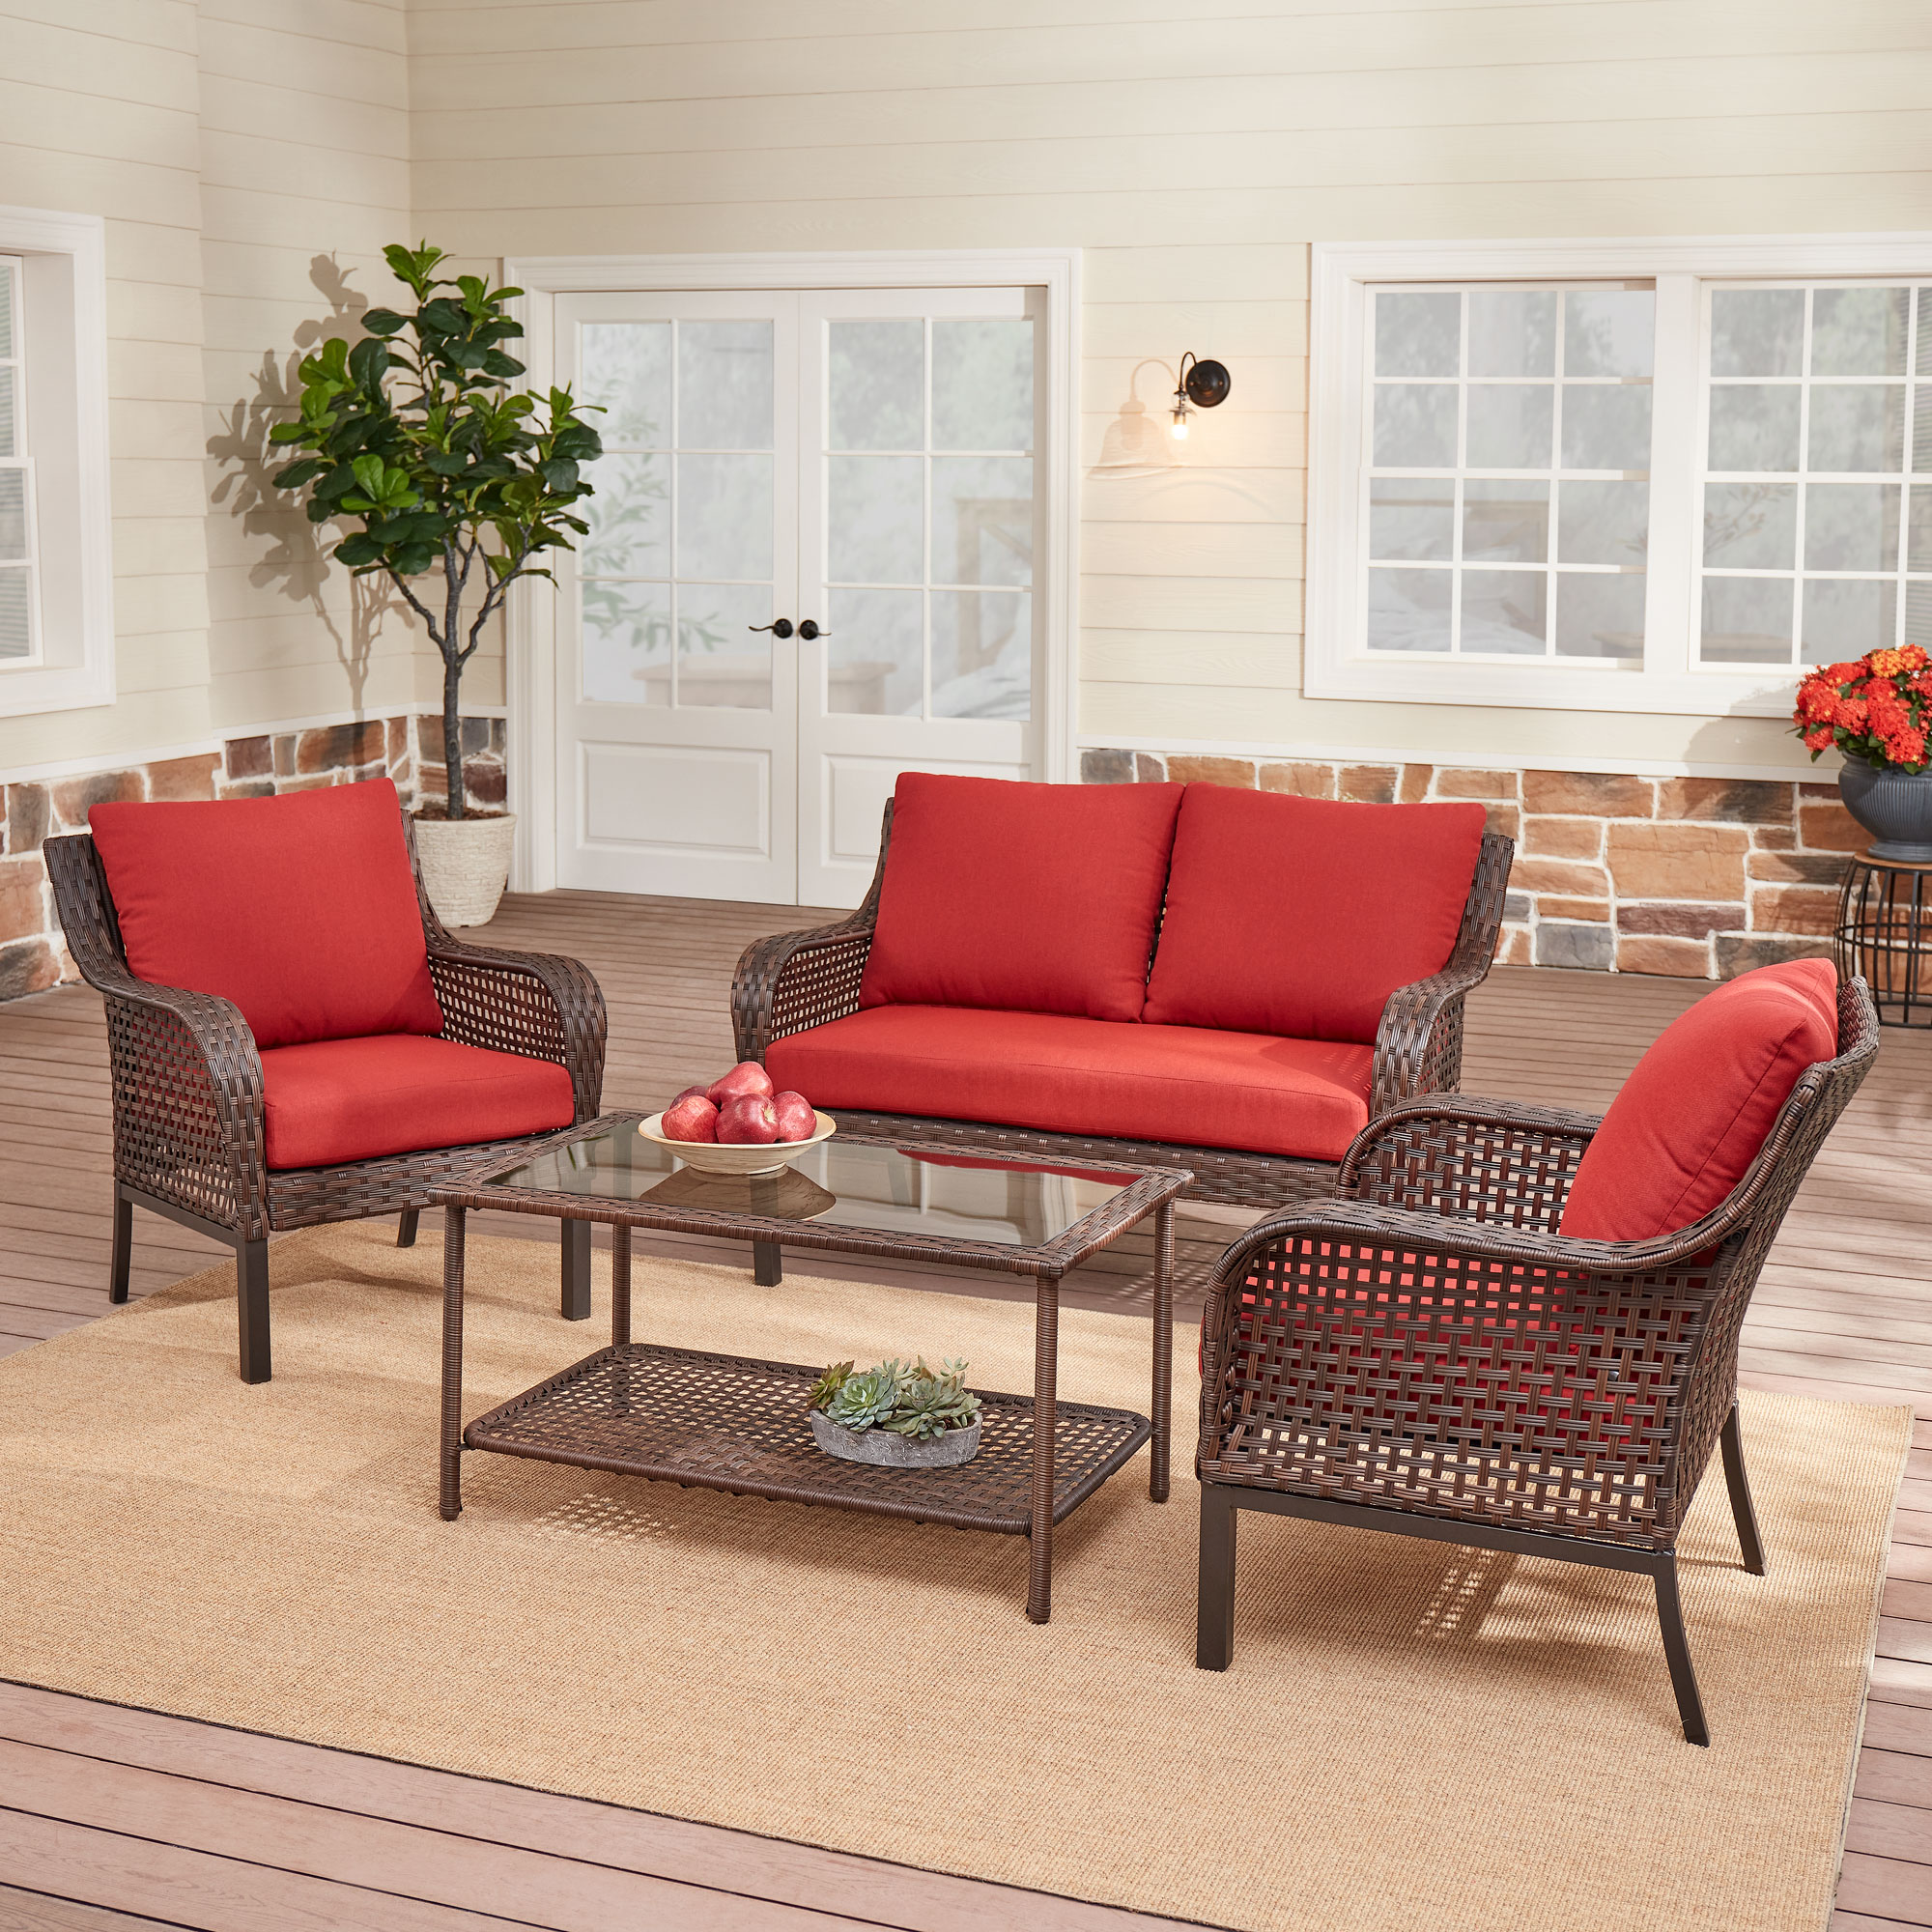 red mainstays patio furniture walmart com